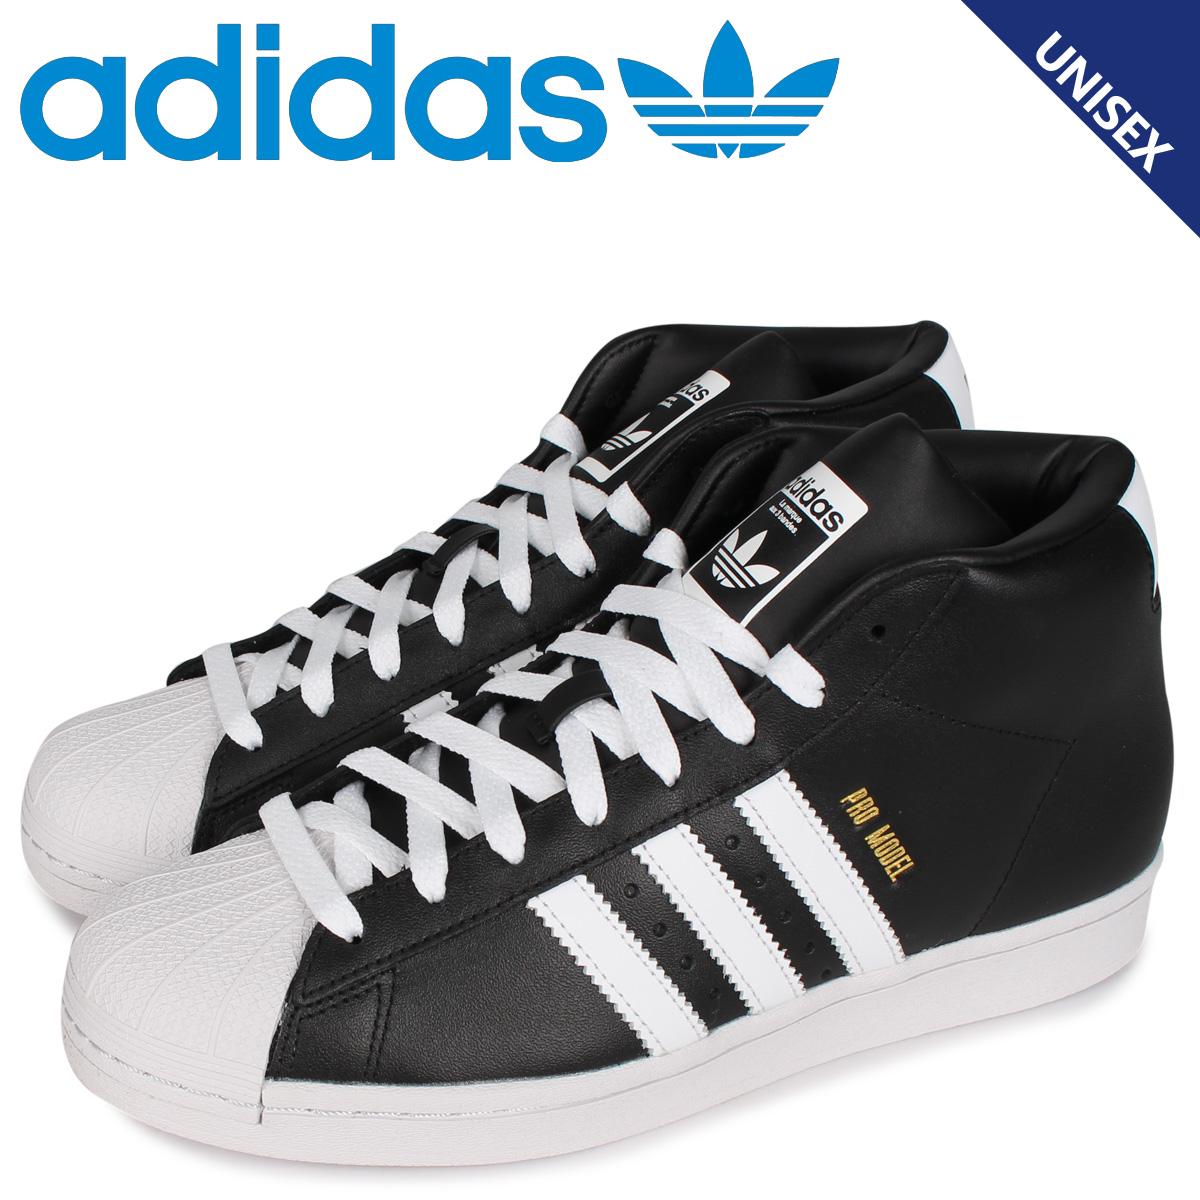 adidas Originals アディダス オリジナルス プロモデル スニーカー メンズ レディース PRO MODEL ブラック 黒 FV4498 [4/27 新入荷]